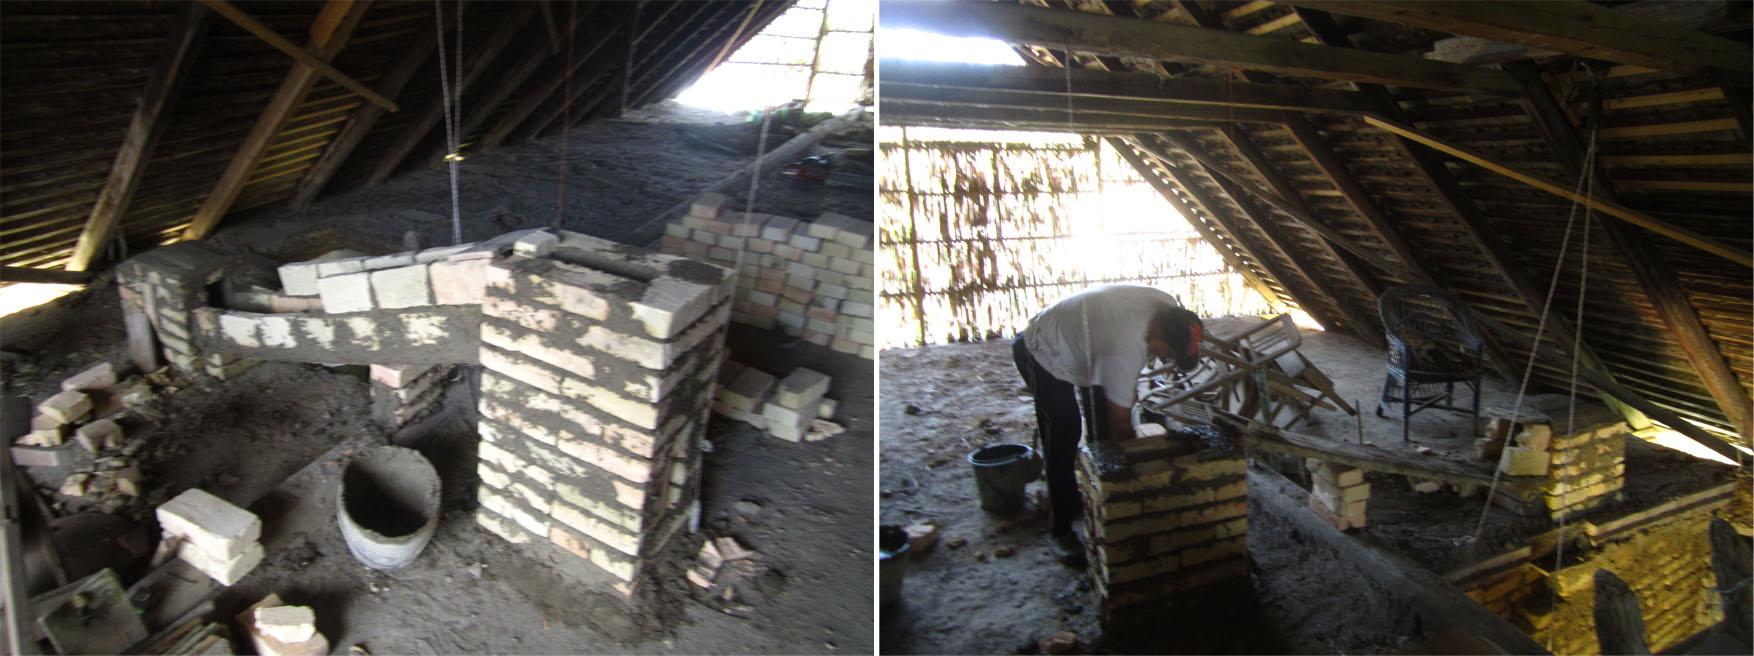 43 Mosorin prosta pec radionica zidanje odzaka  jun 2014